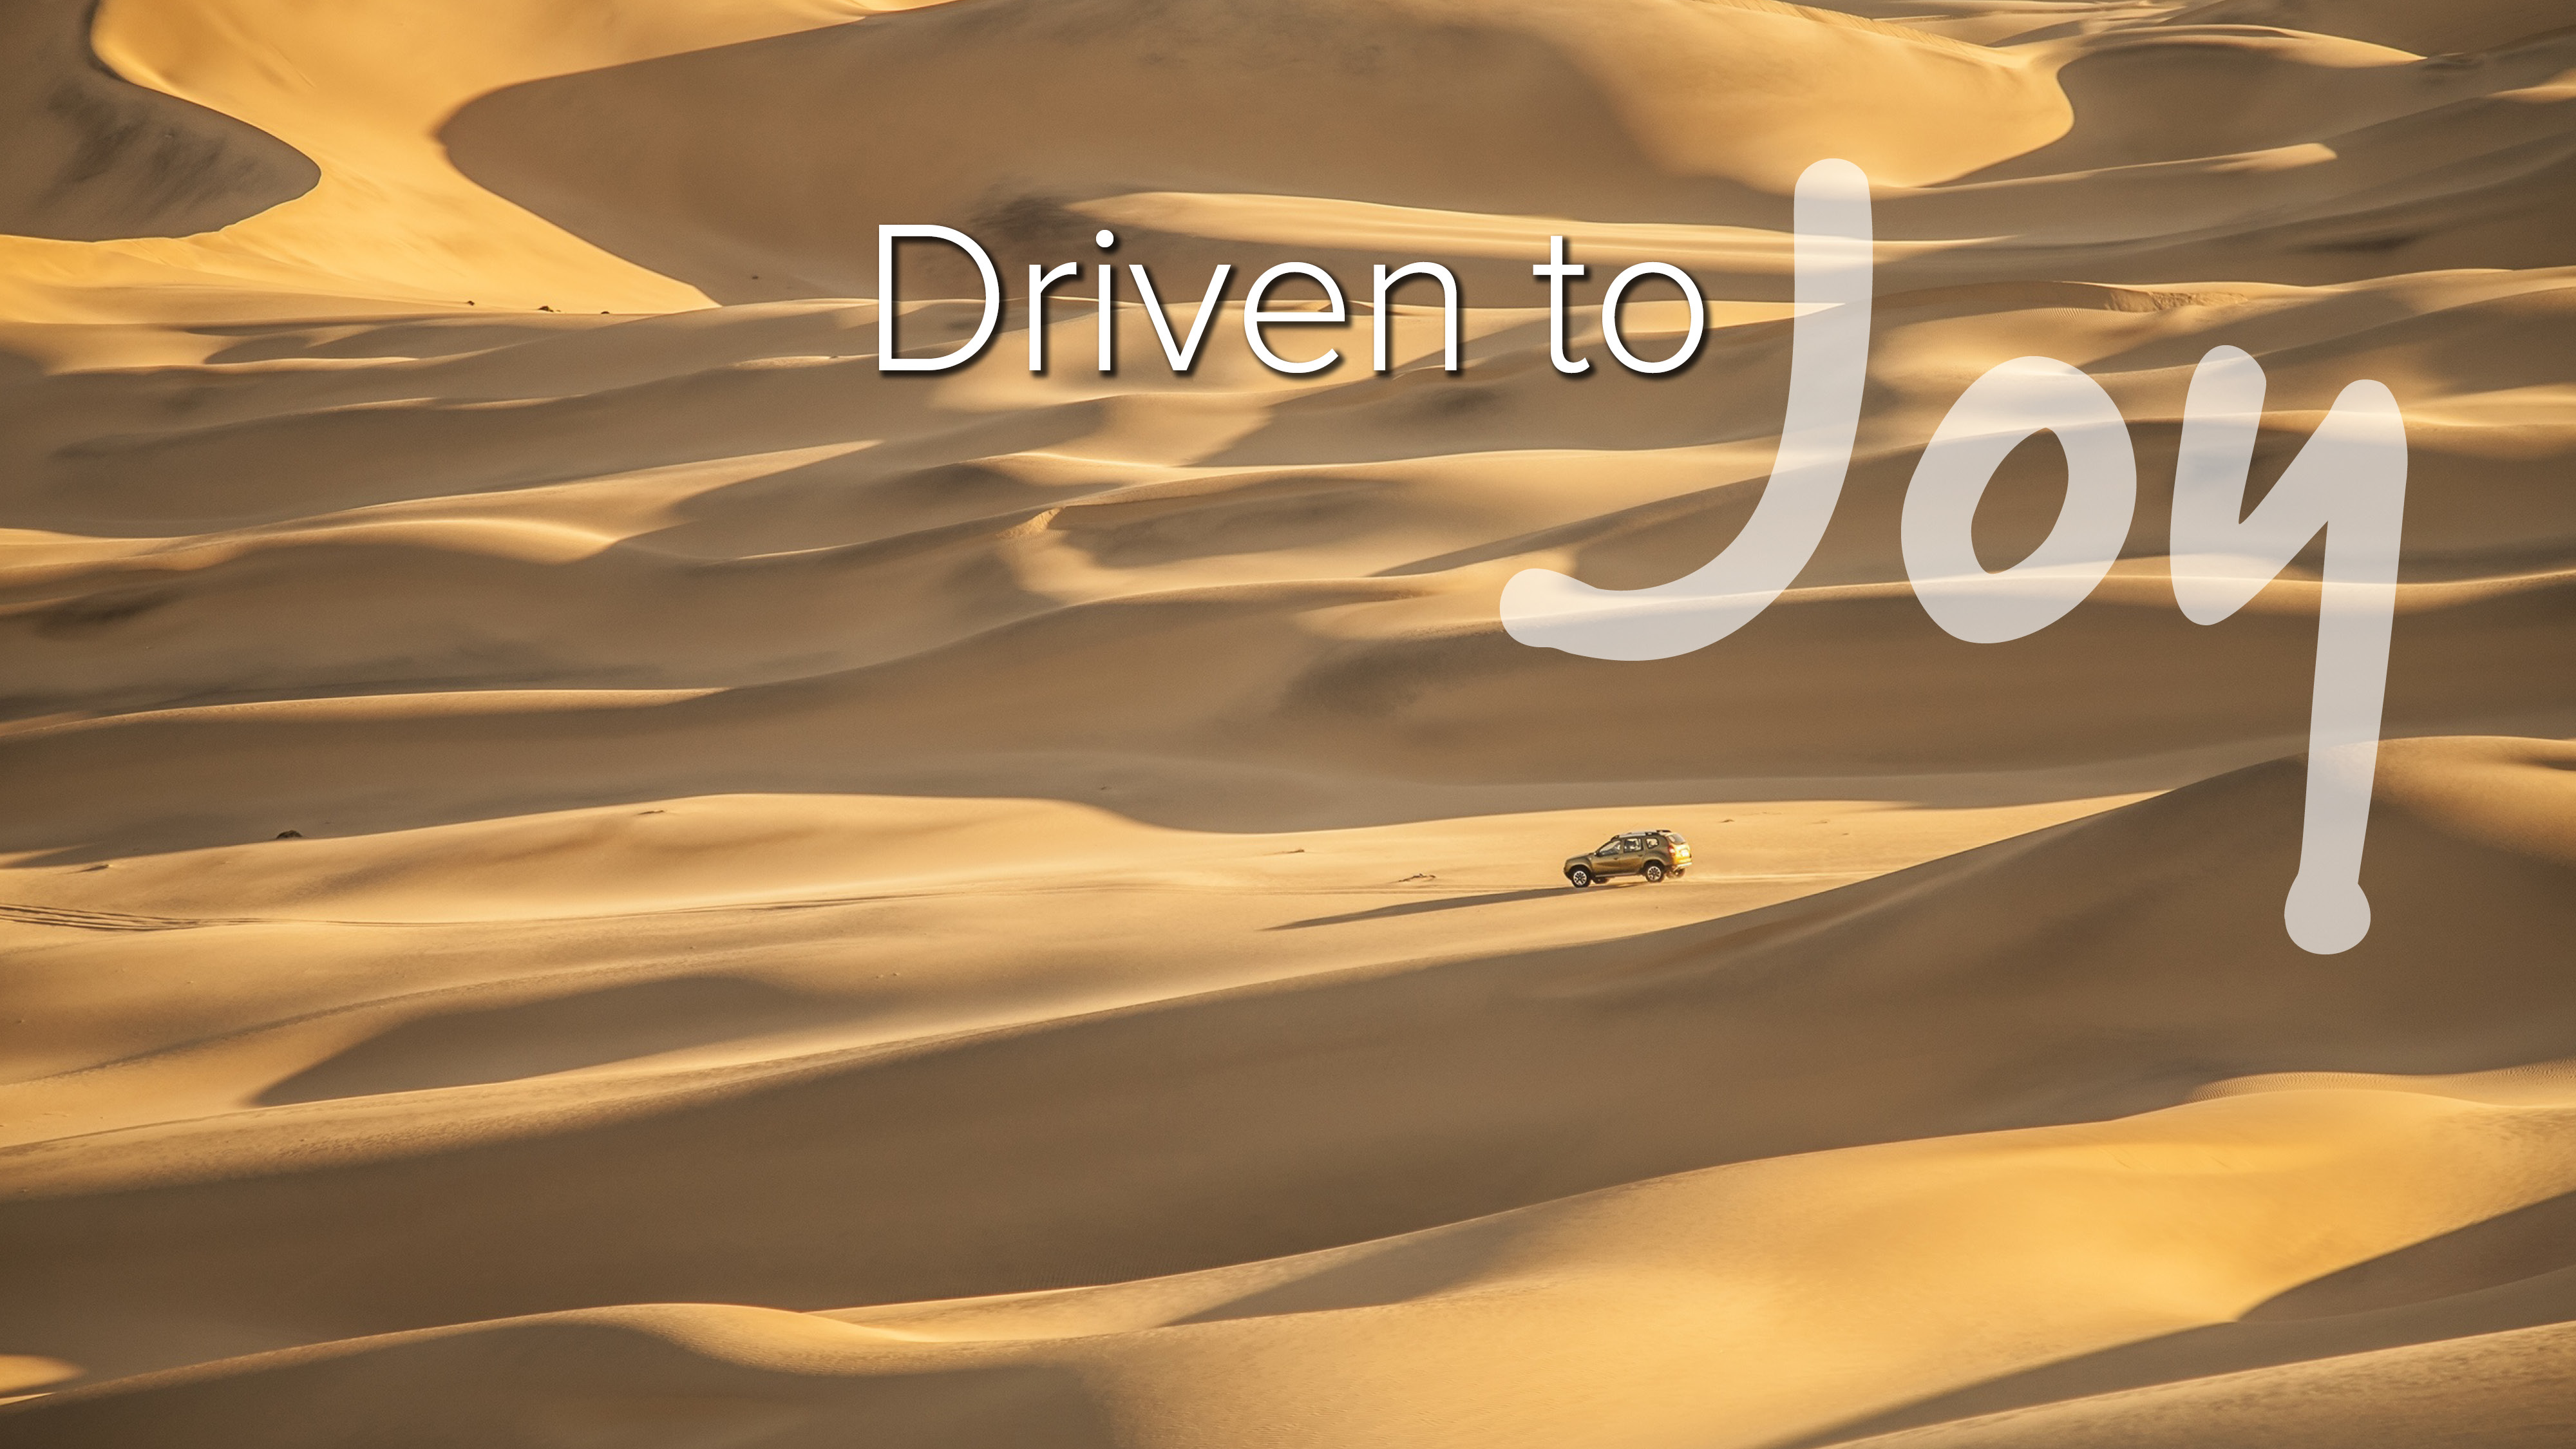 Driven to Joy